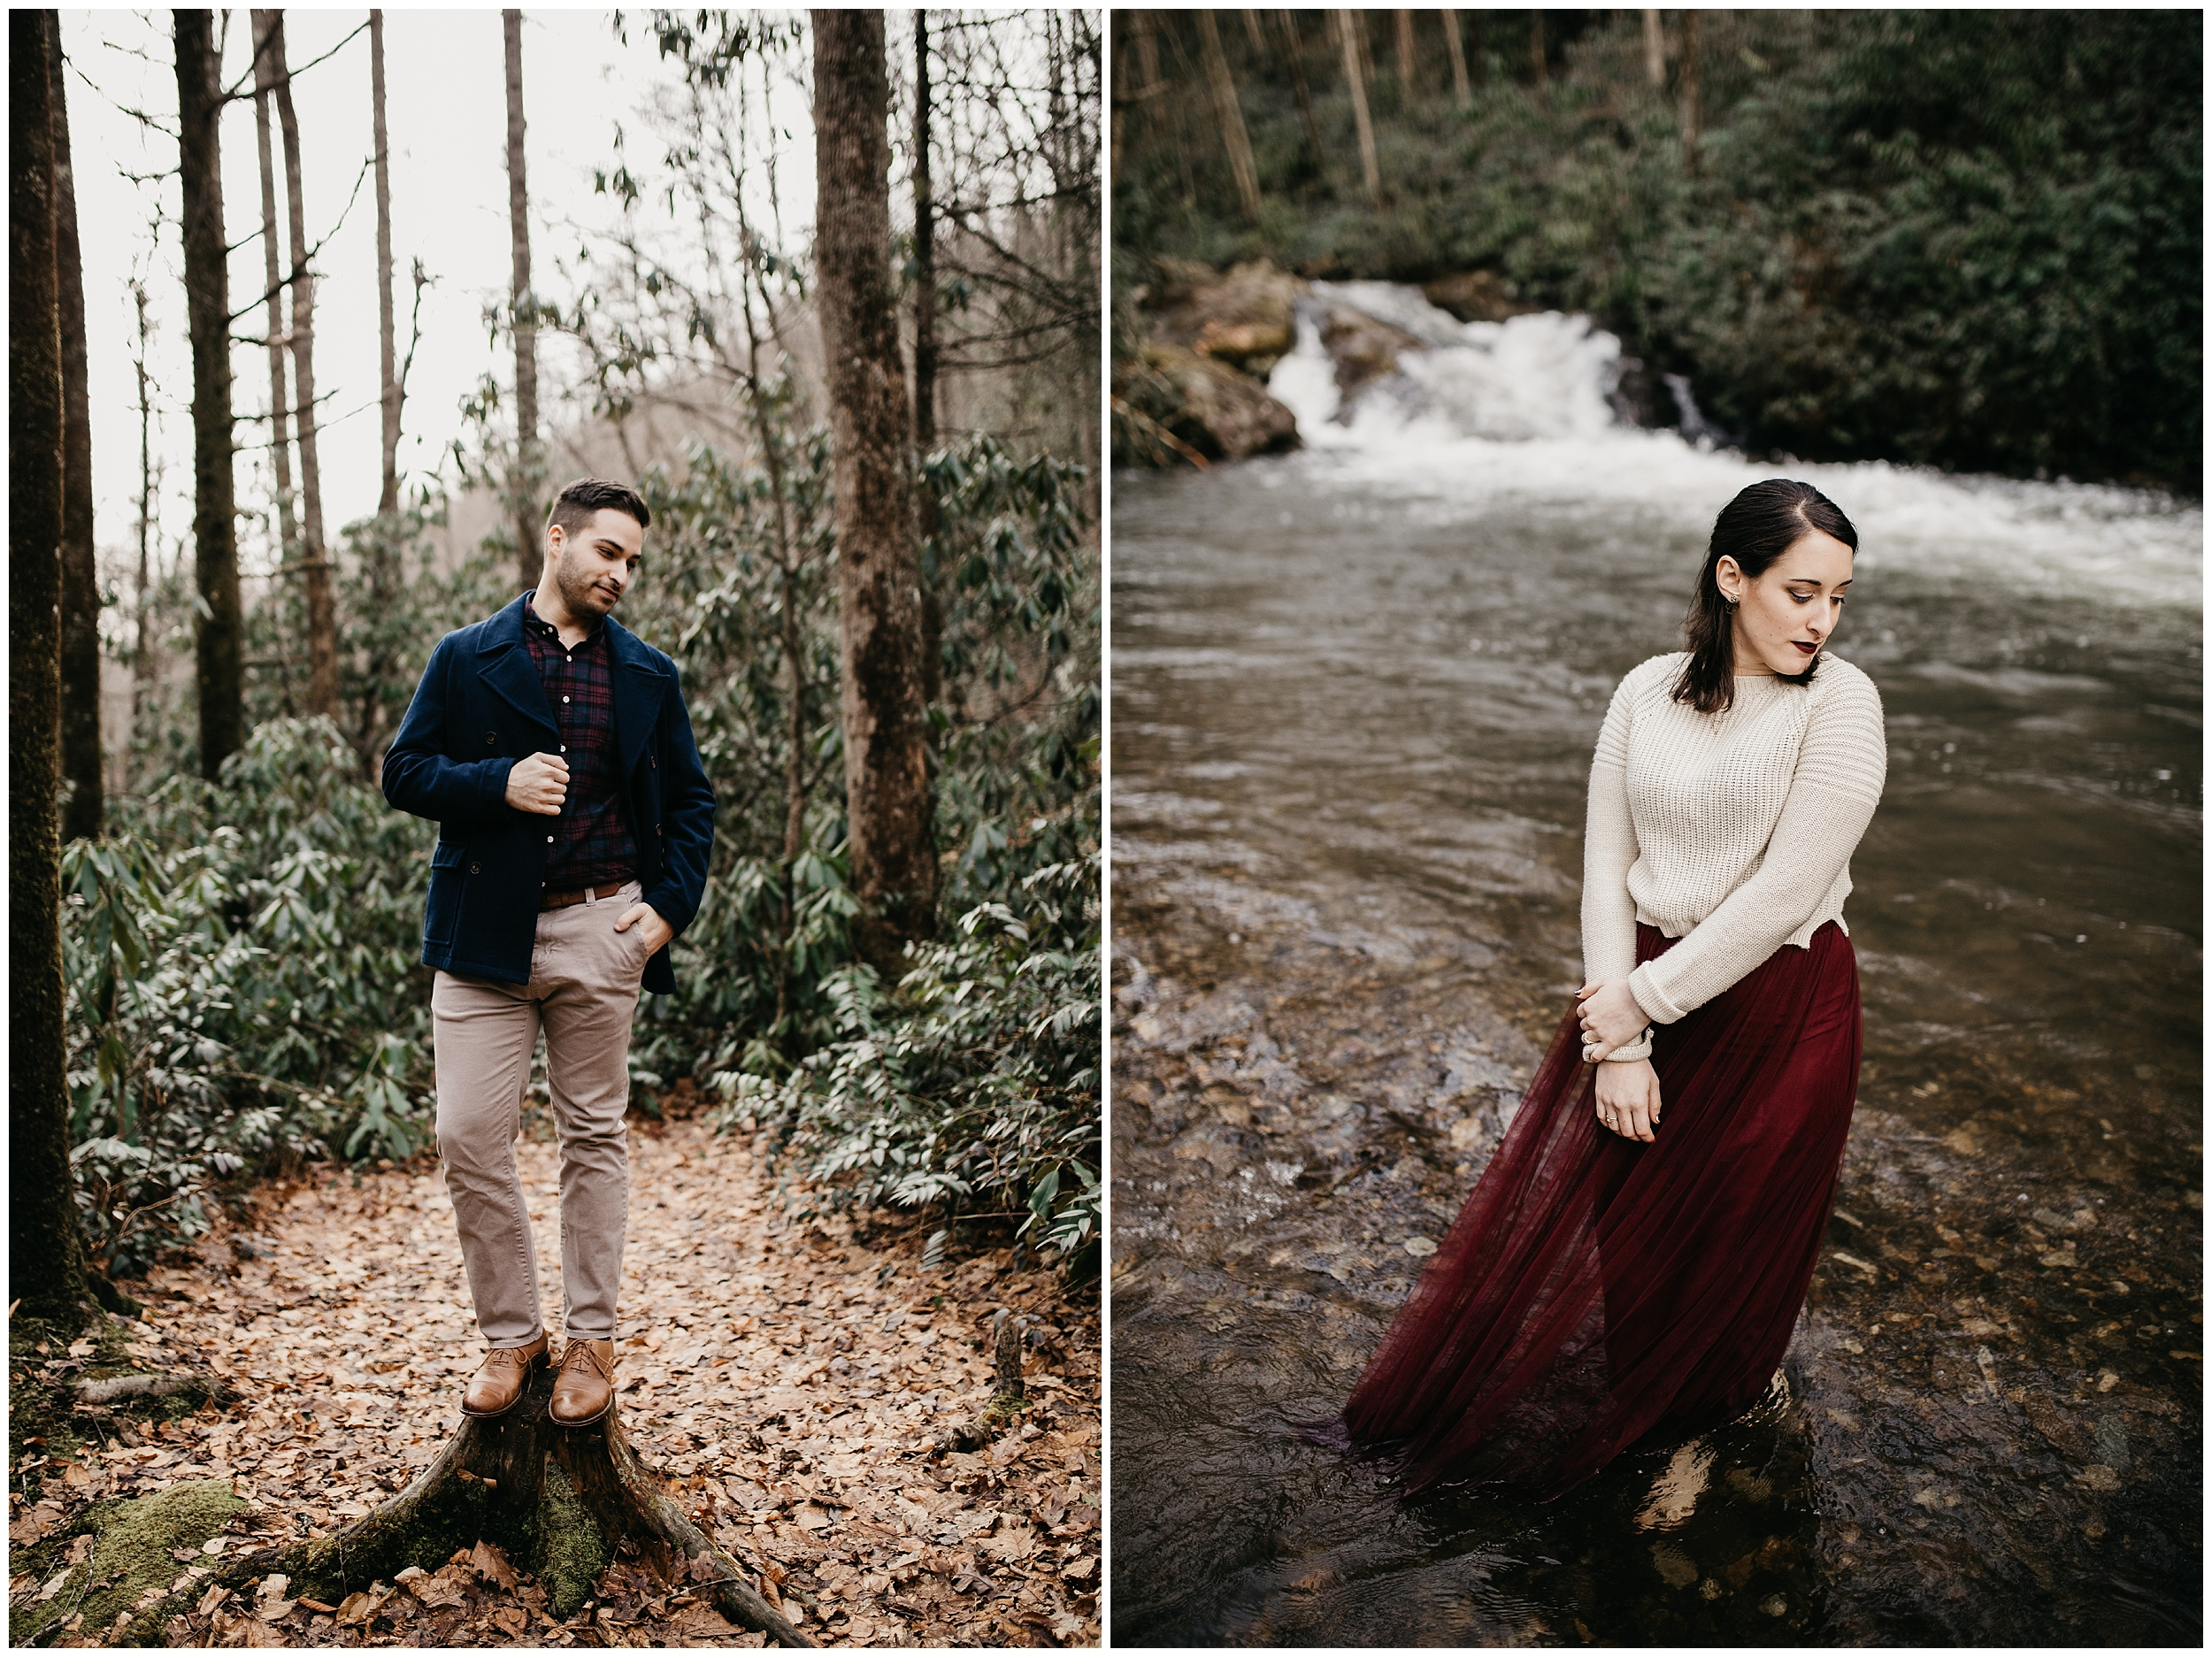 lovestoriesco-asheville-wedding-photographers-engagement-max-patch-mountain_0019.jpg